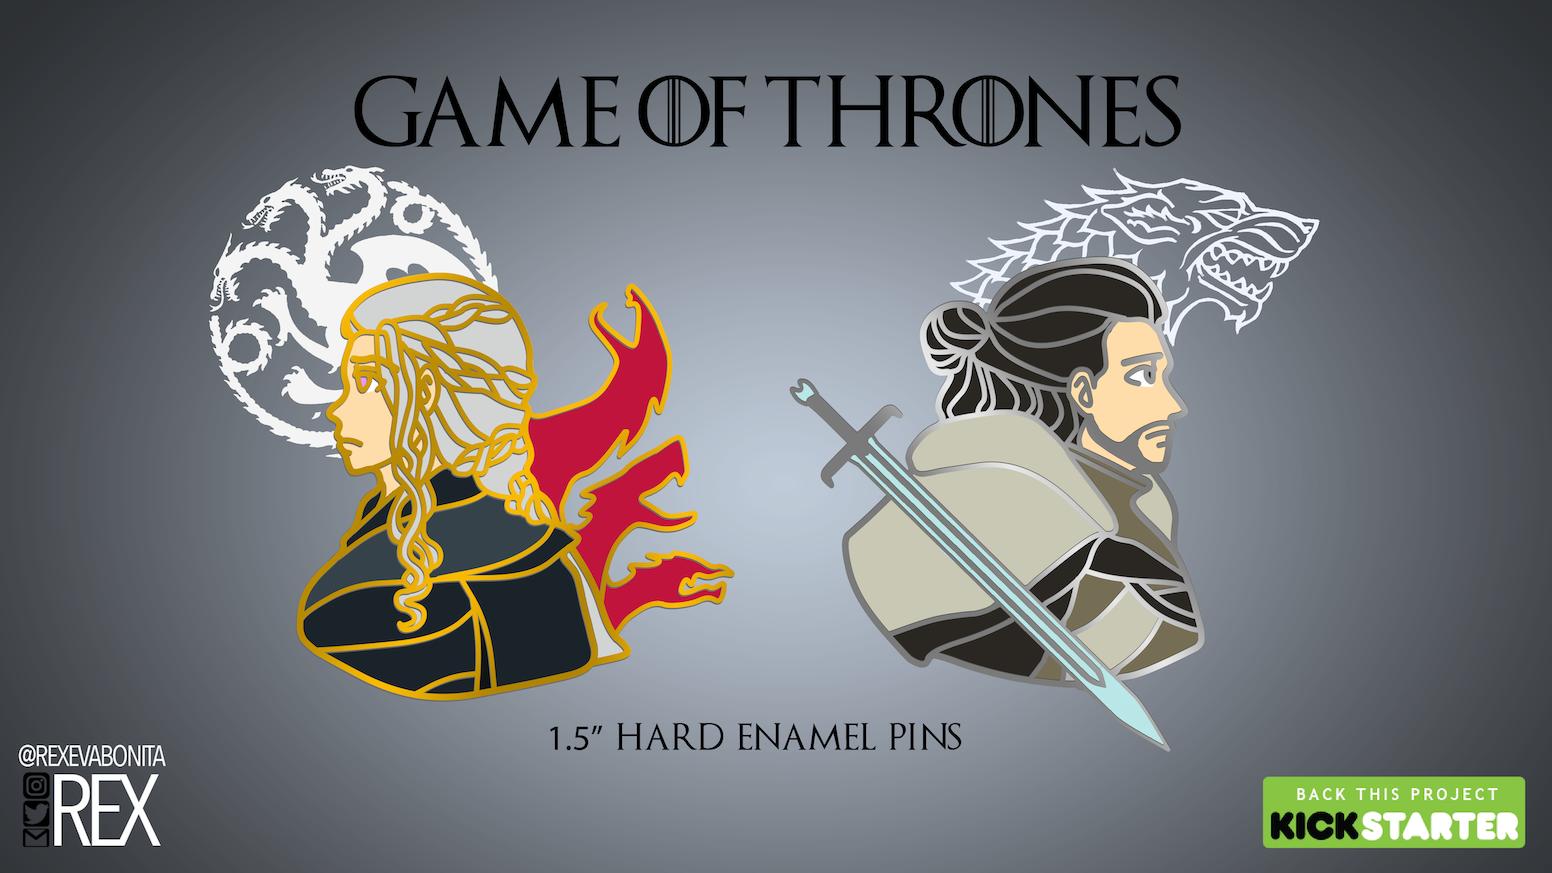 7e464afdf92 WINTER IS HERE! Creating Game of Thrones hard enamel pins of Daenerys  Targaryen and Jon